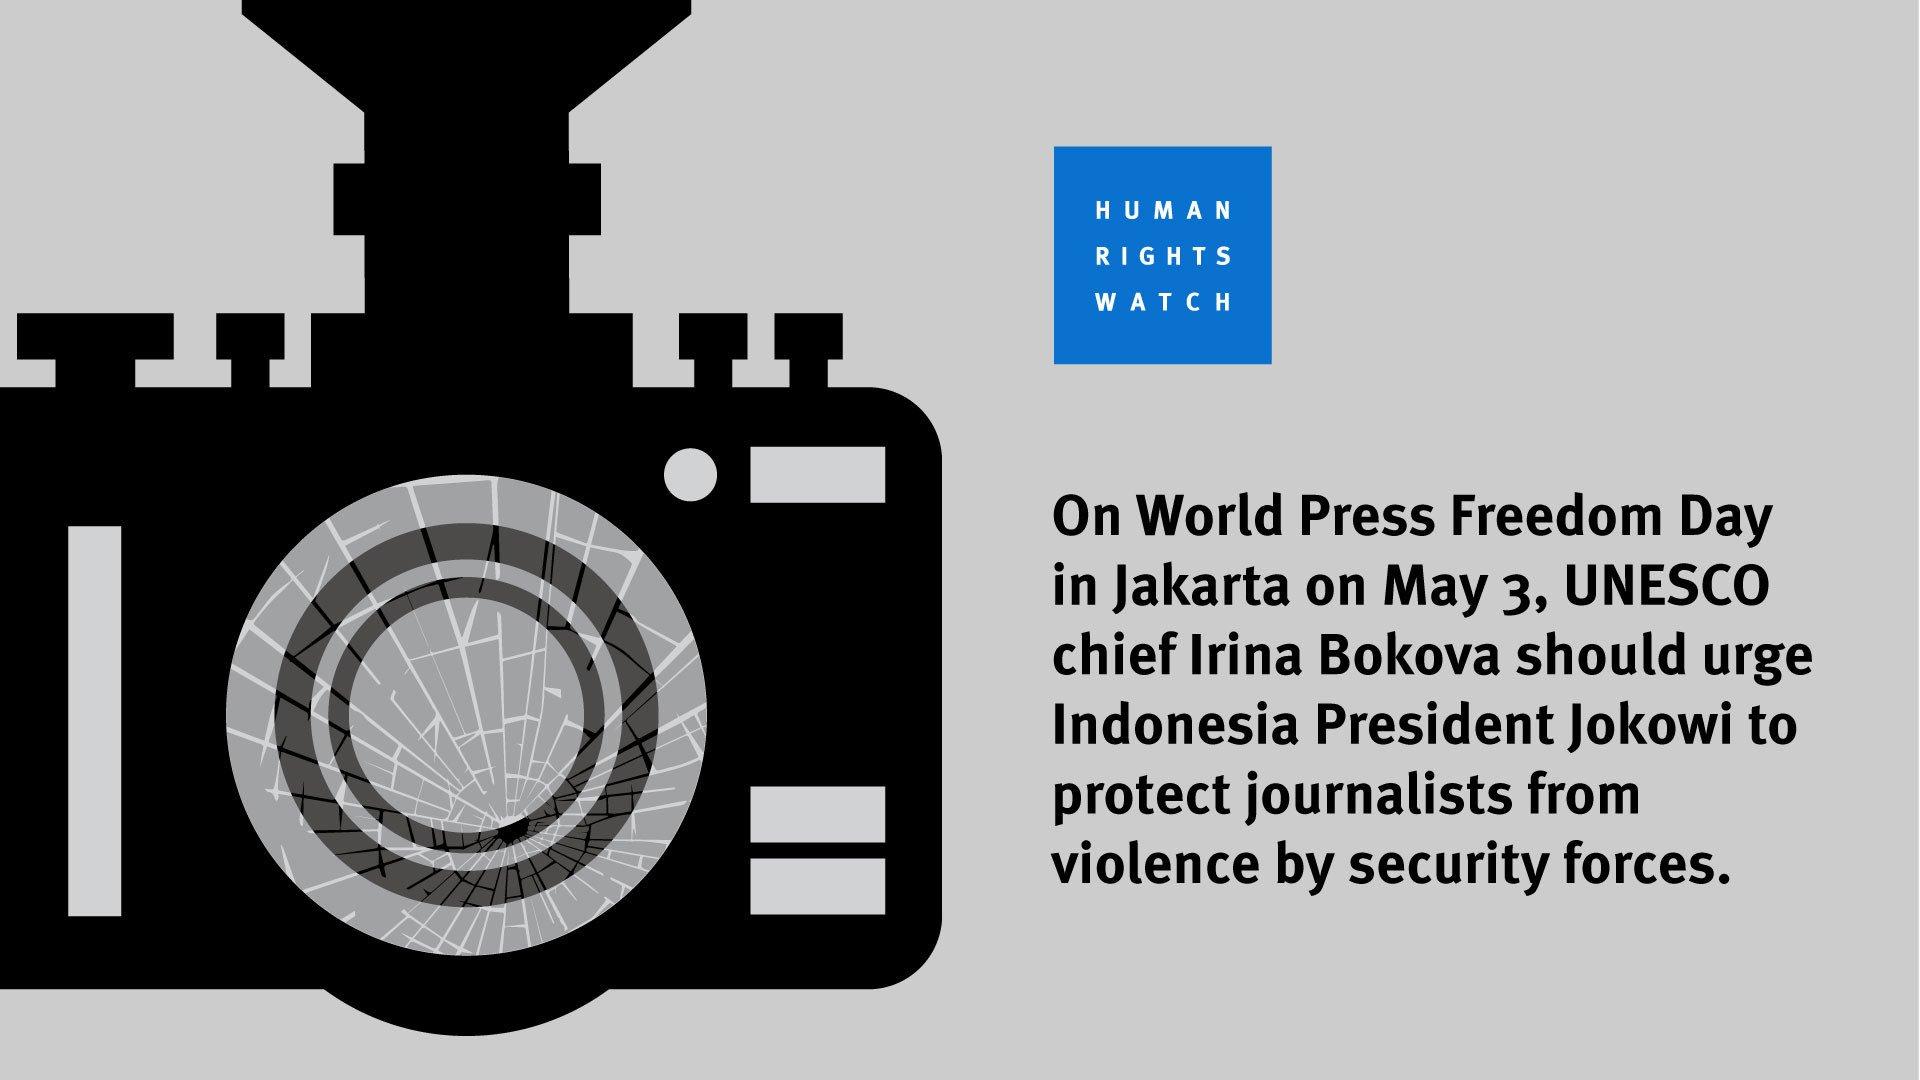 World Press Freedom Day | Human Rights Watch